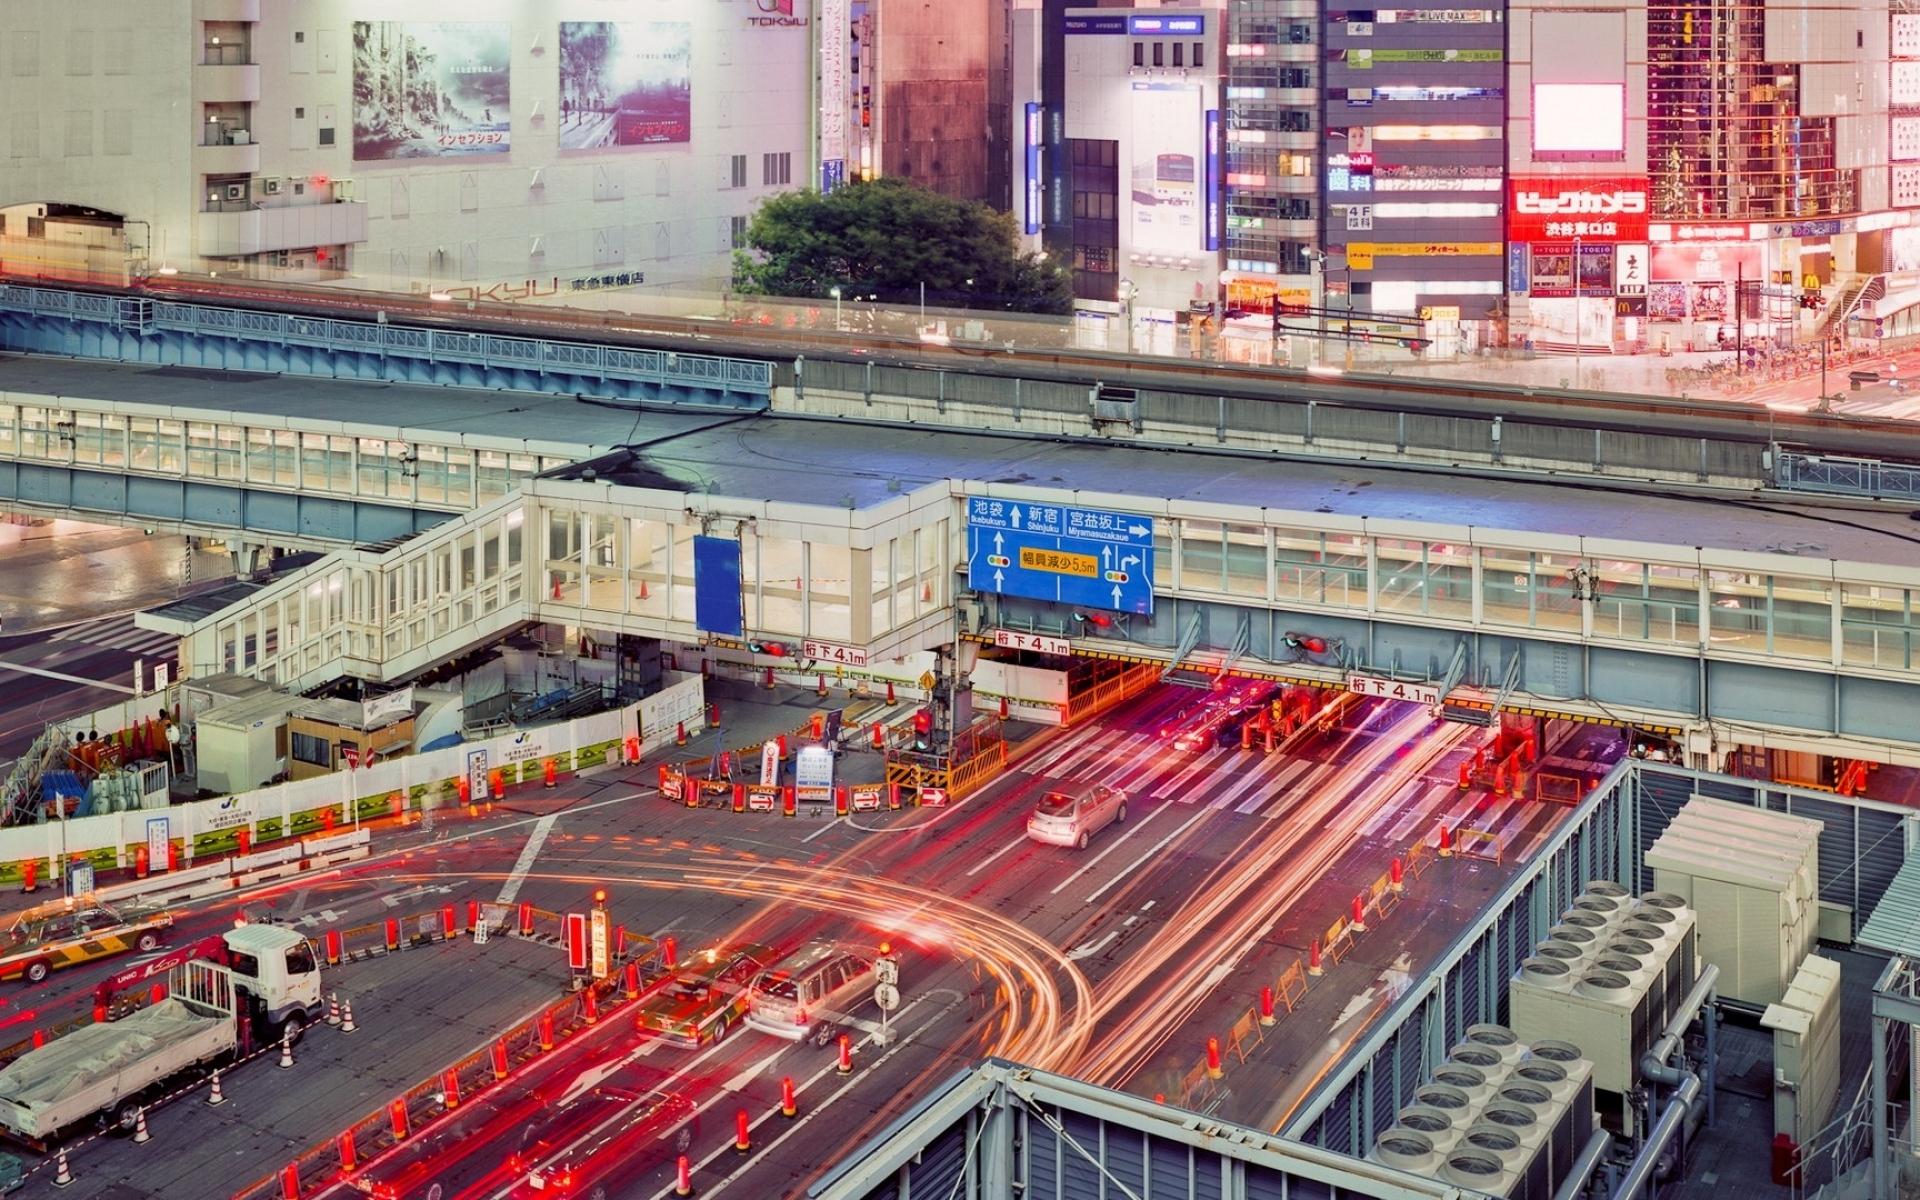 Картинки Япония, Токио, Мост, Город, дорога, движение фото и обои на рабочий стол